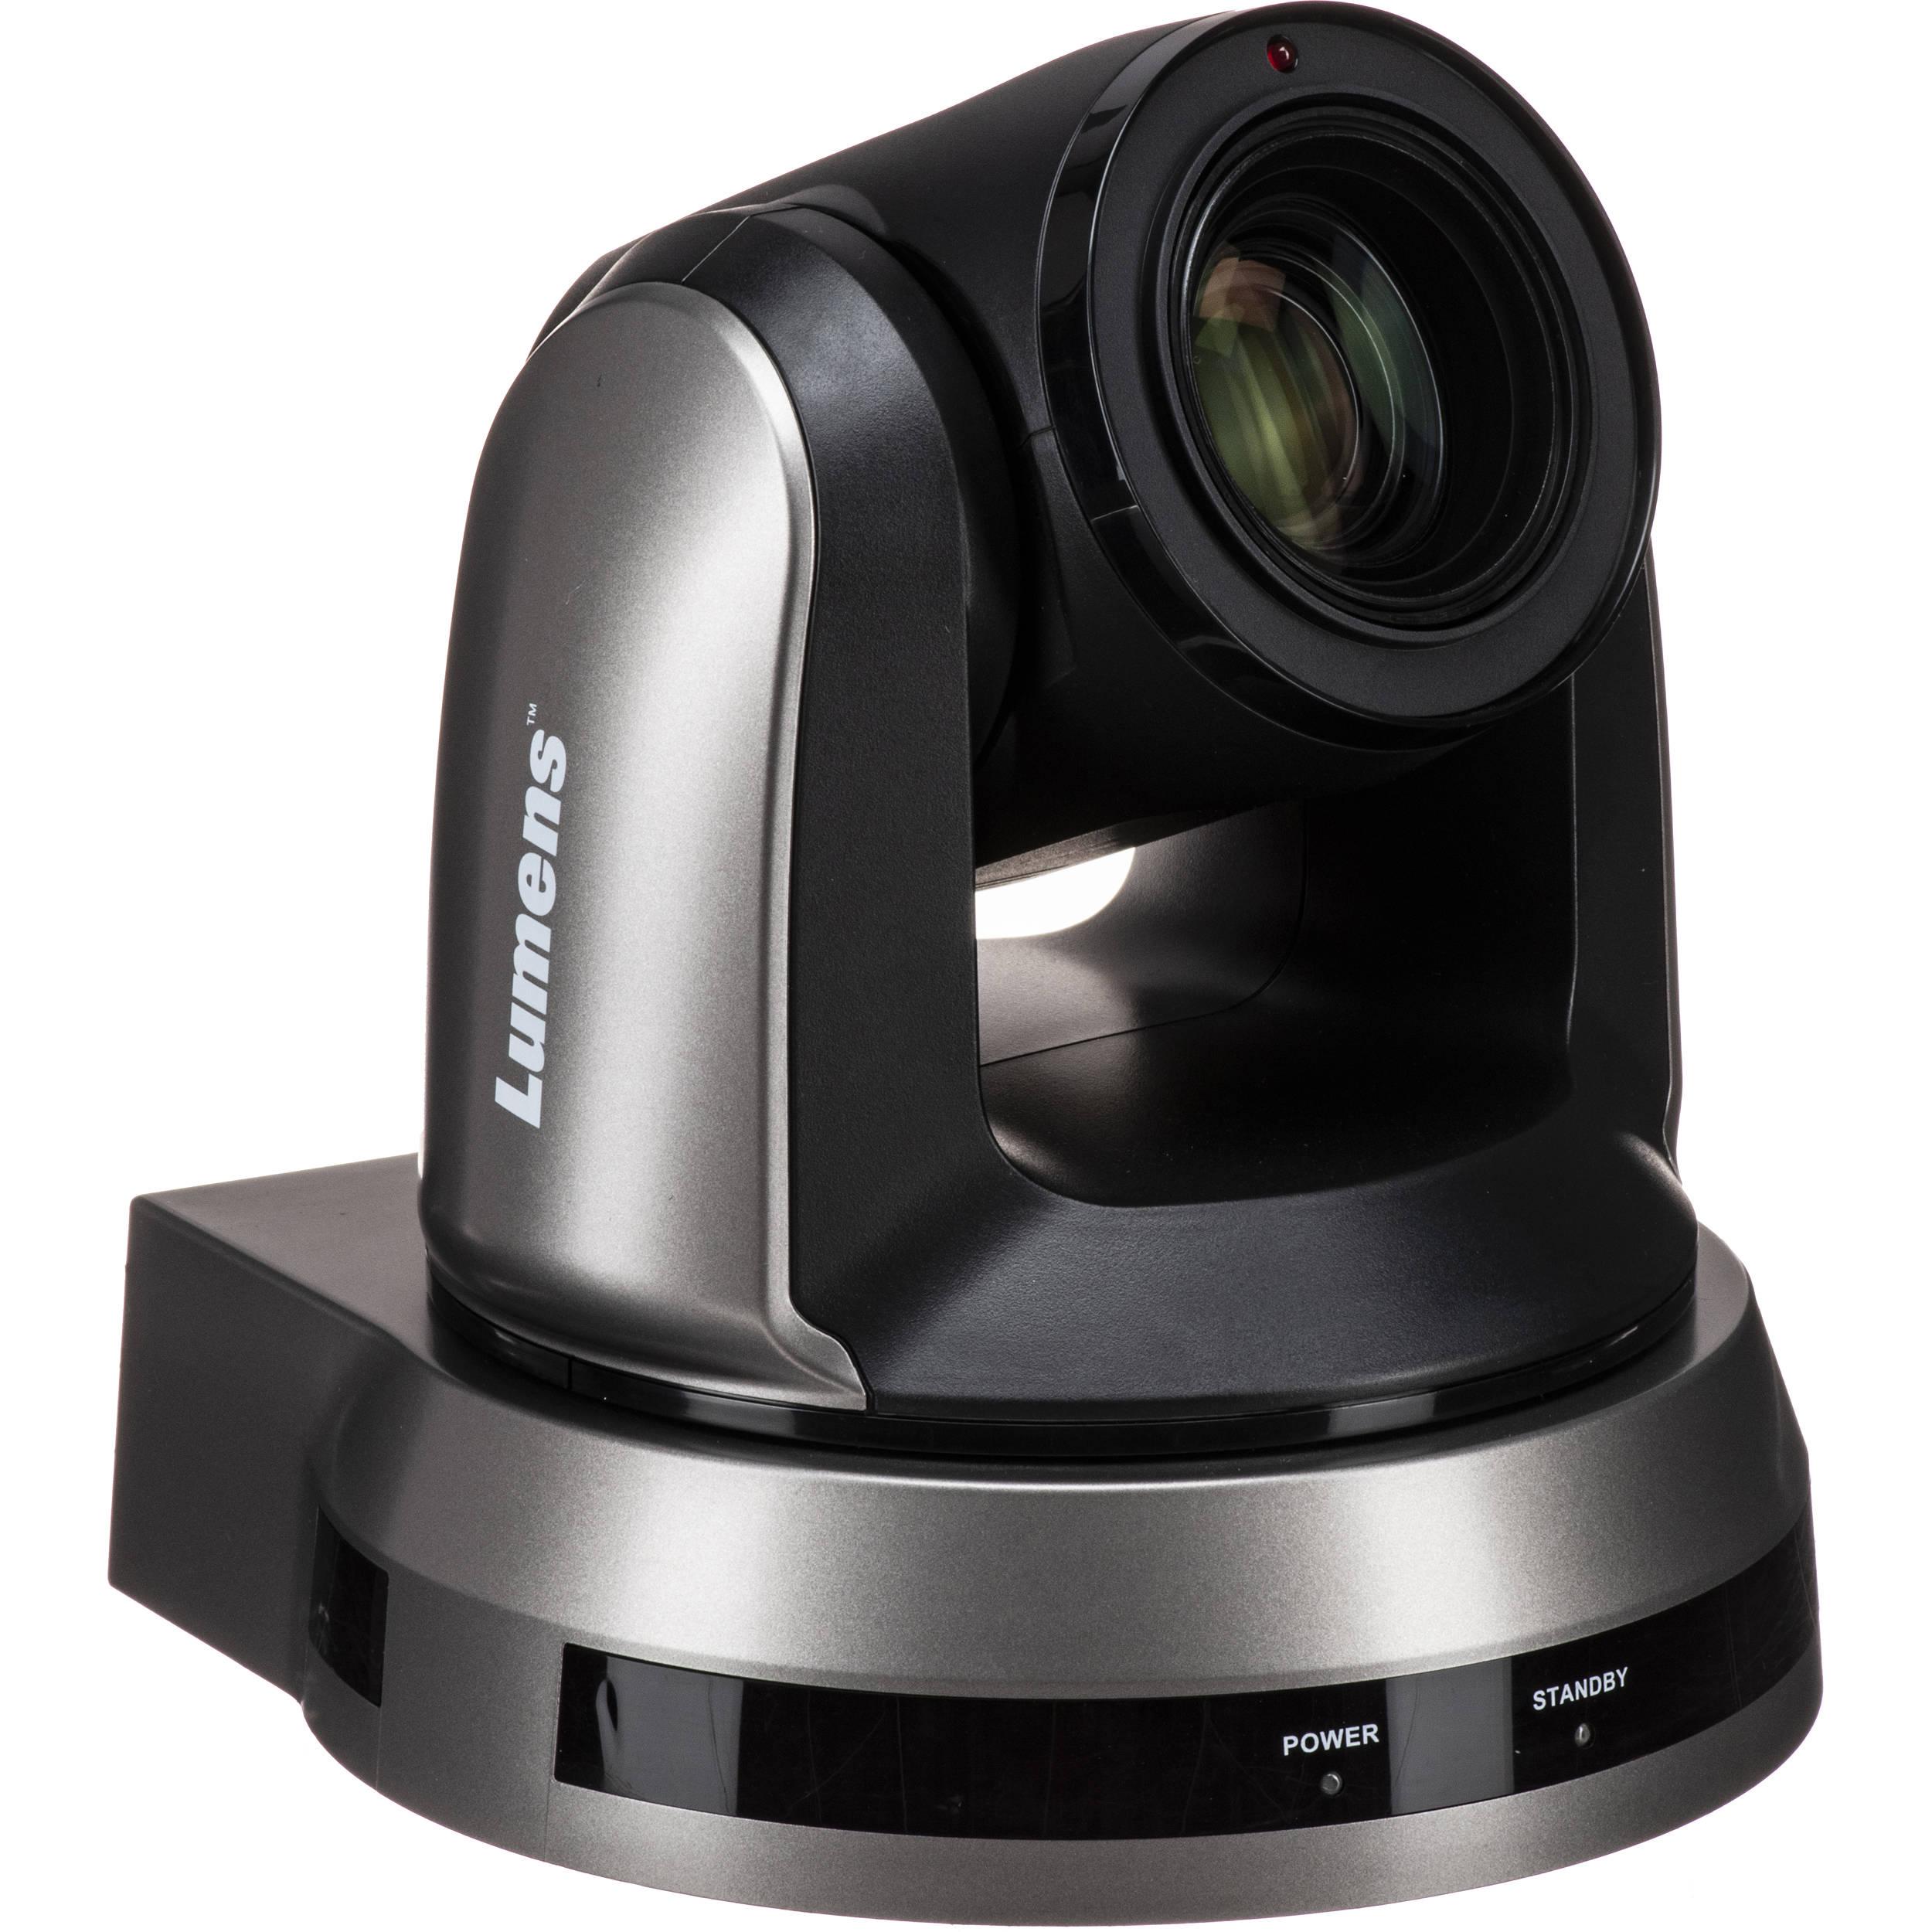 4K UHD 12x Optical Zoom PTZ Video Camera (Black)